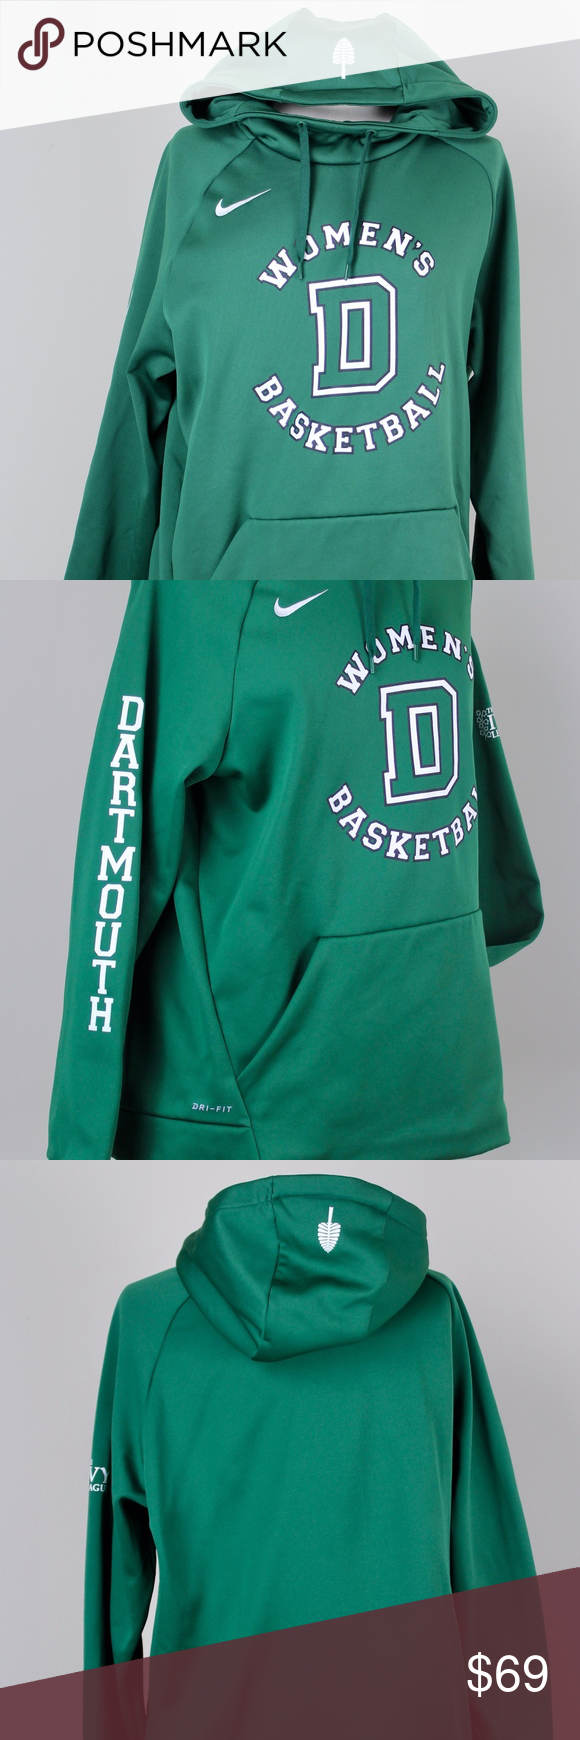 Dartmouth Women S Basketball Hoodie L Niki Dri Fit This Is A Wonderful Like New Dartmouth Women S Basketball Fleece Hoo Womens Basketball Dri Fit Fleece Hoodie [ 1740 x 580 Pixel ]